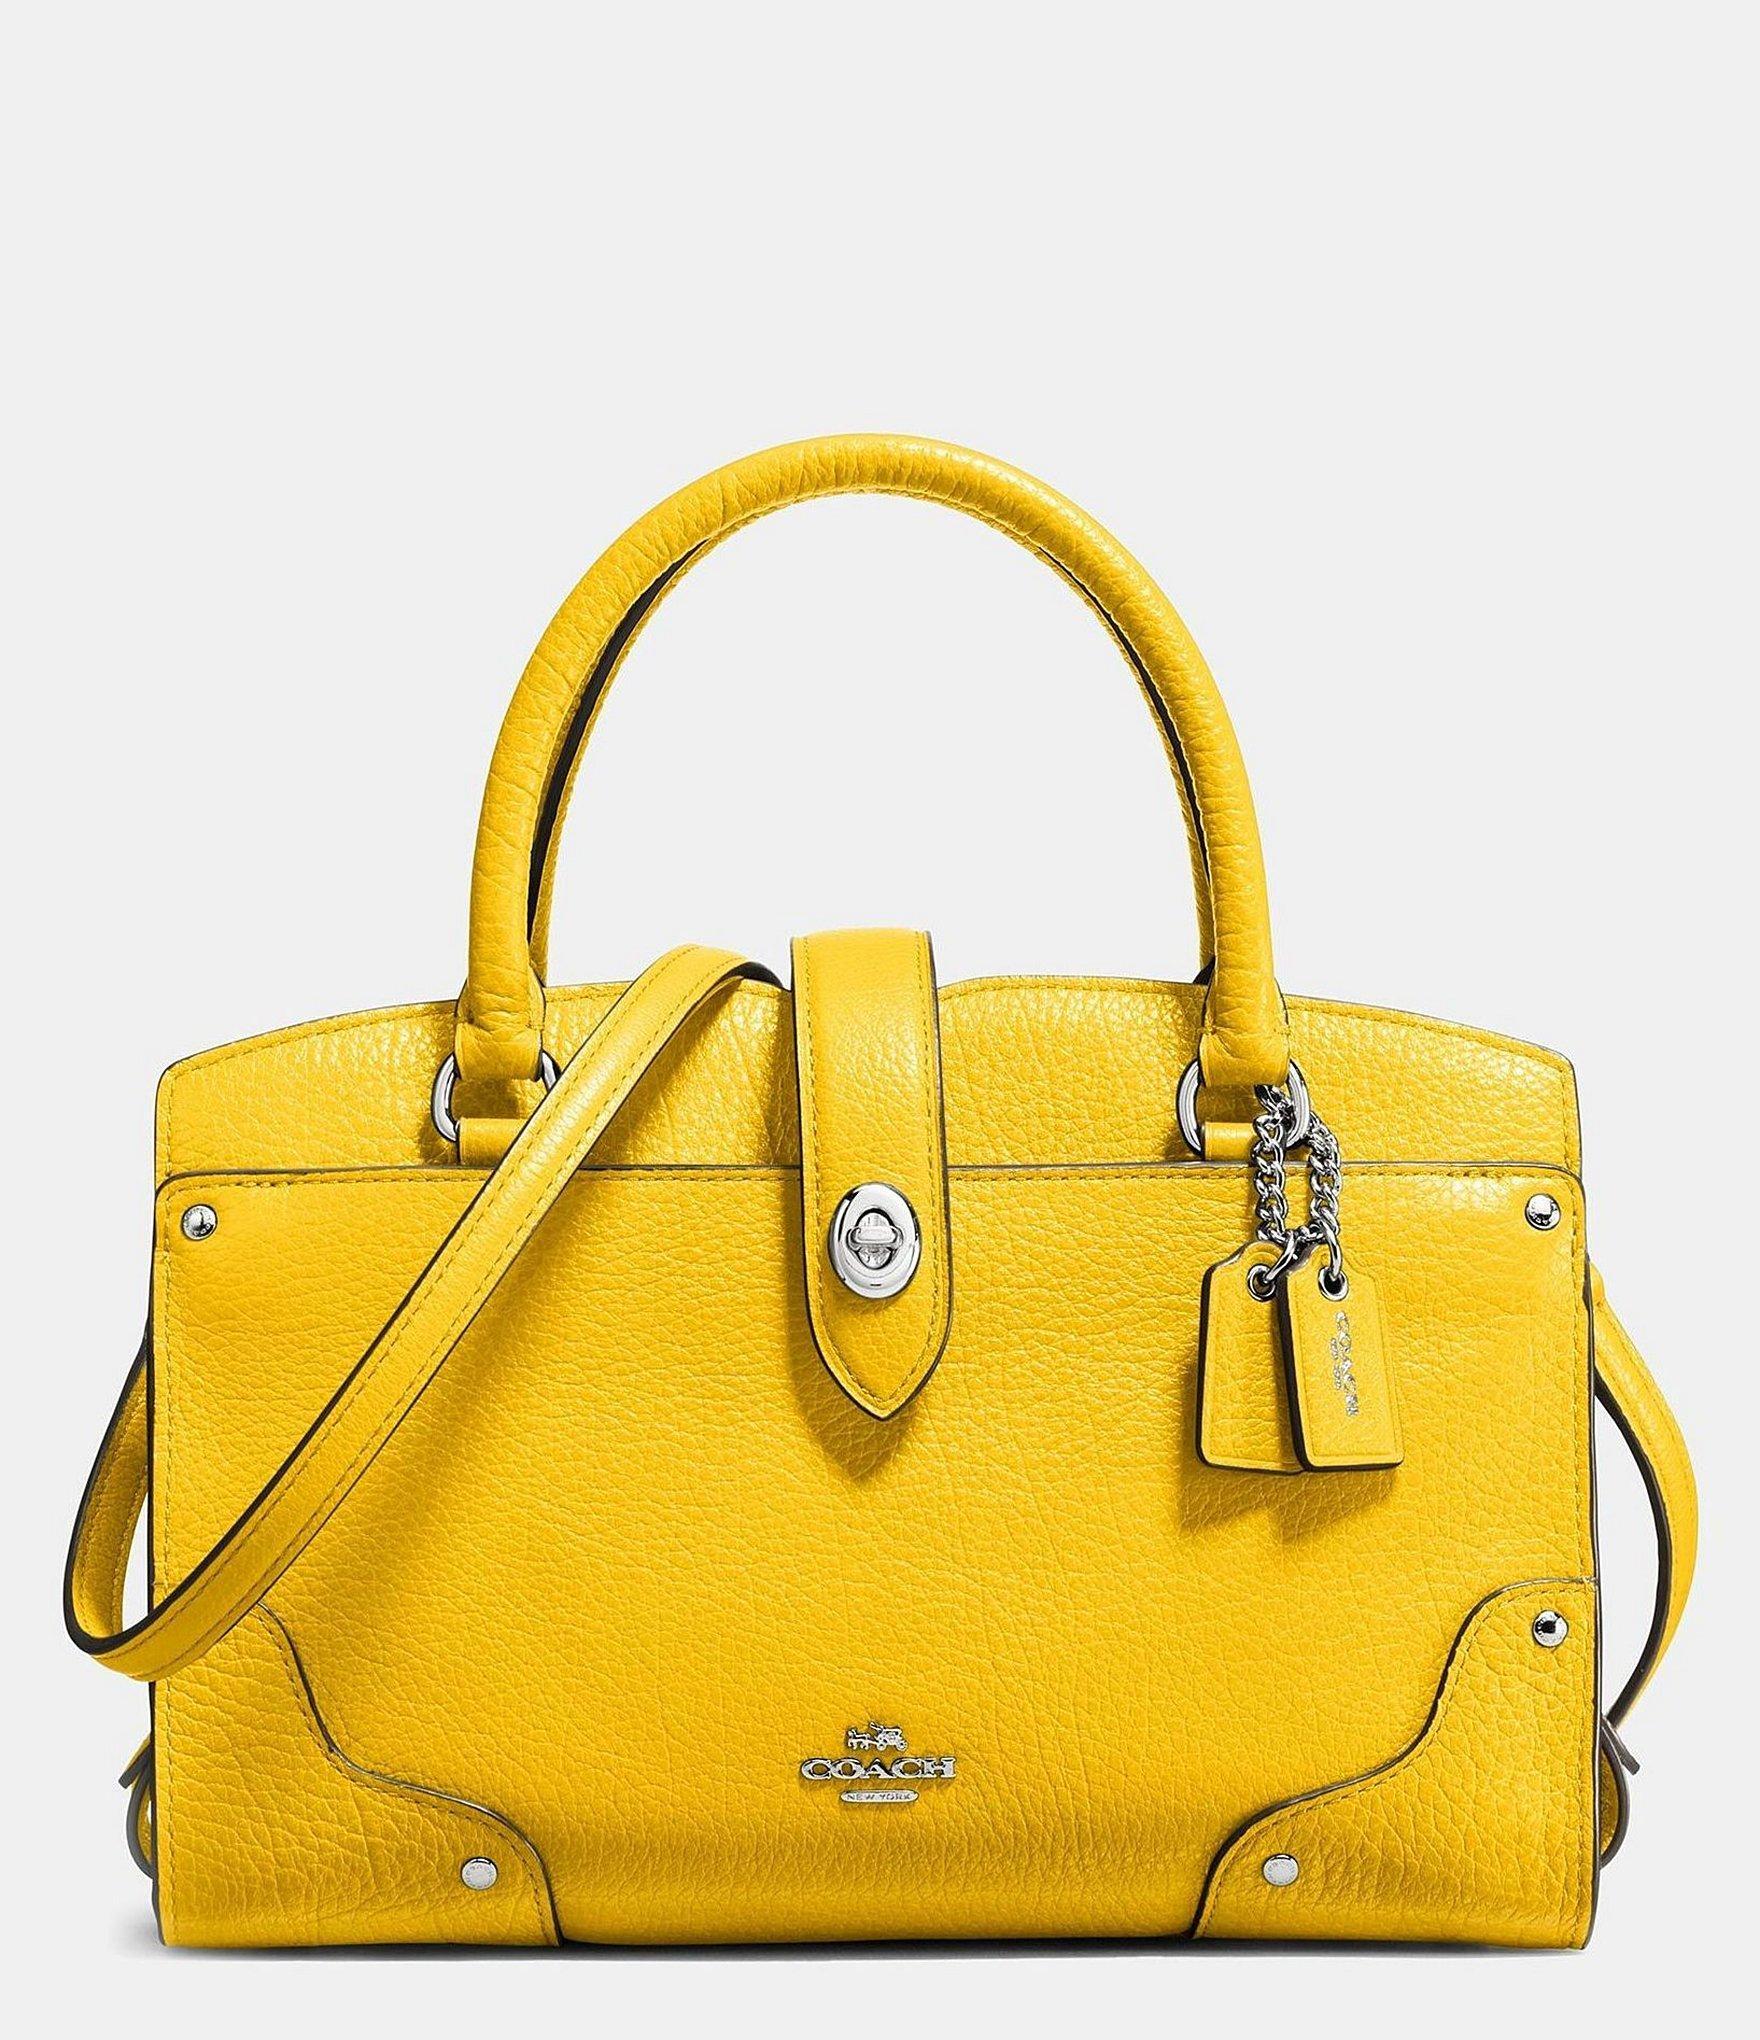 b8dab32c1f Lyst - COACH Mercer Satchel 24 In Grain Leather in Yellow